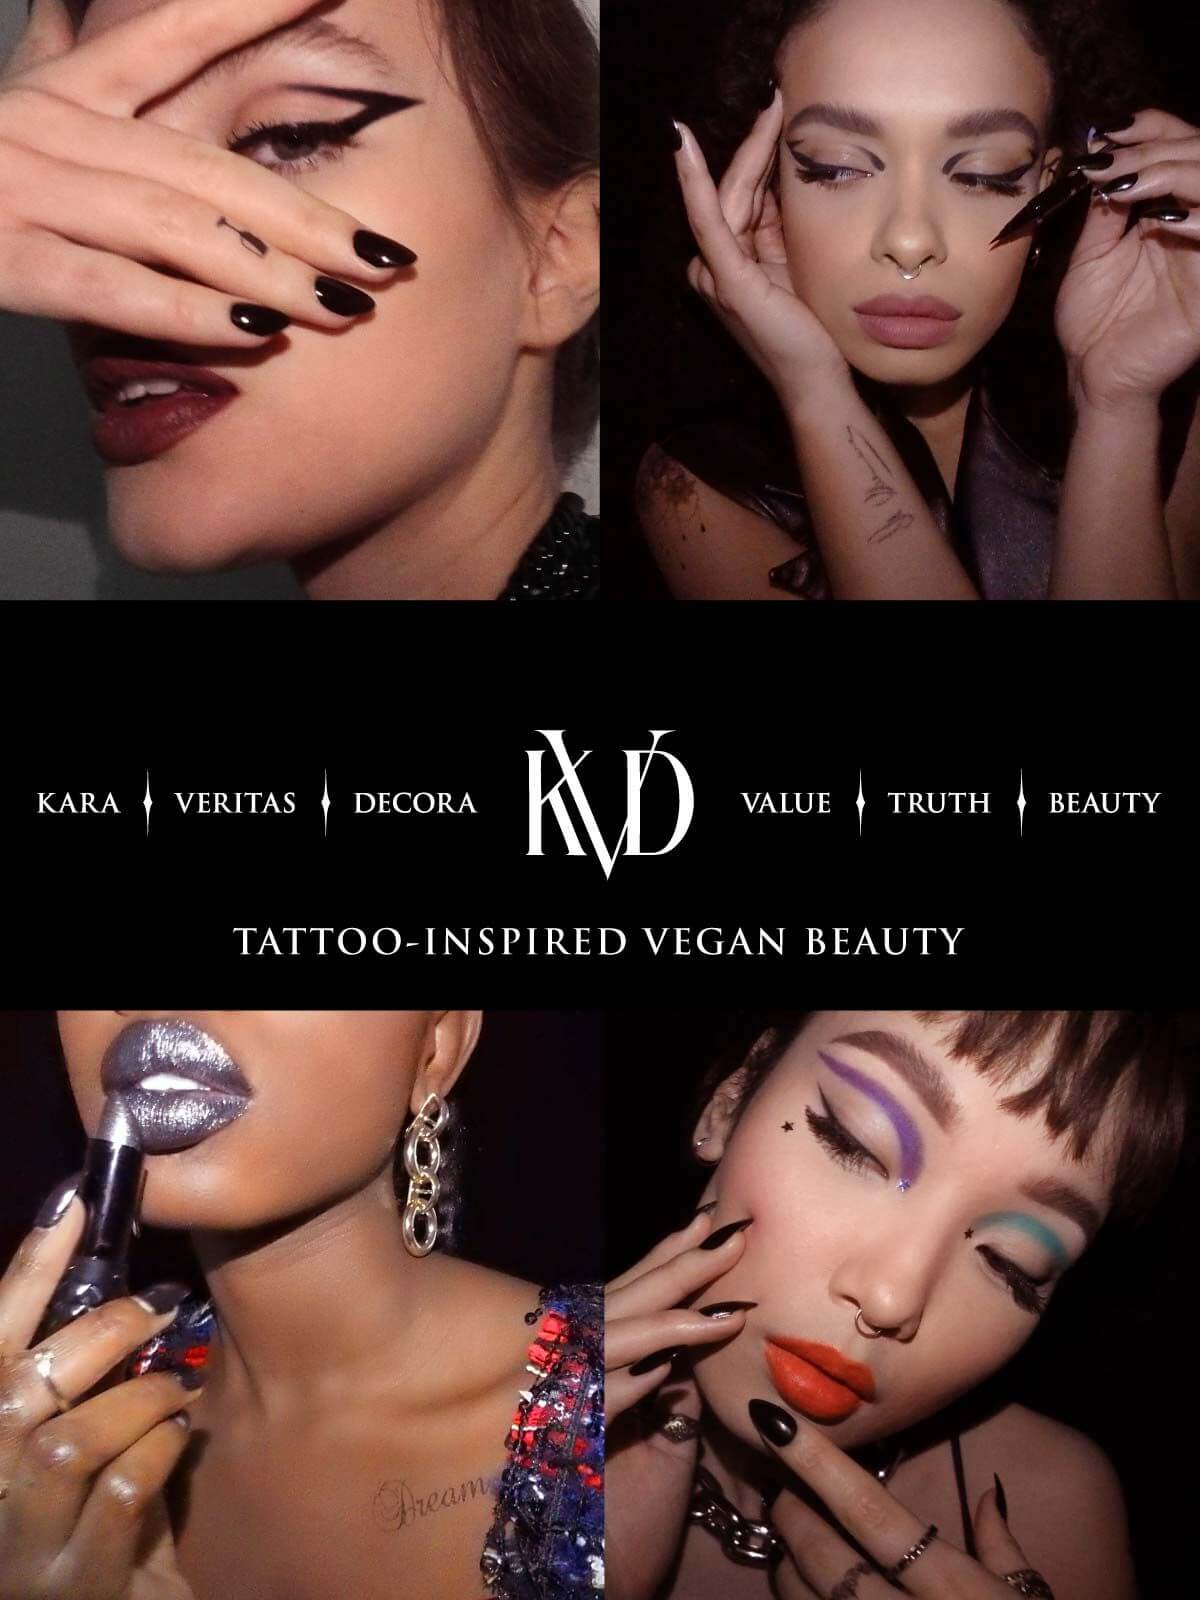 Kara. Veritas. Decora. KVD. Value. Truth. Beauty. Tattoo-inspired vegan beauty.